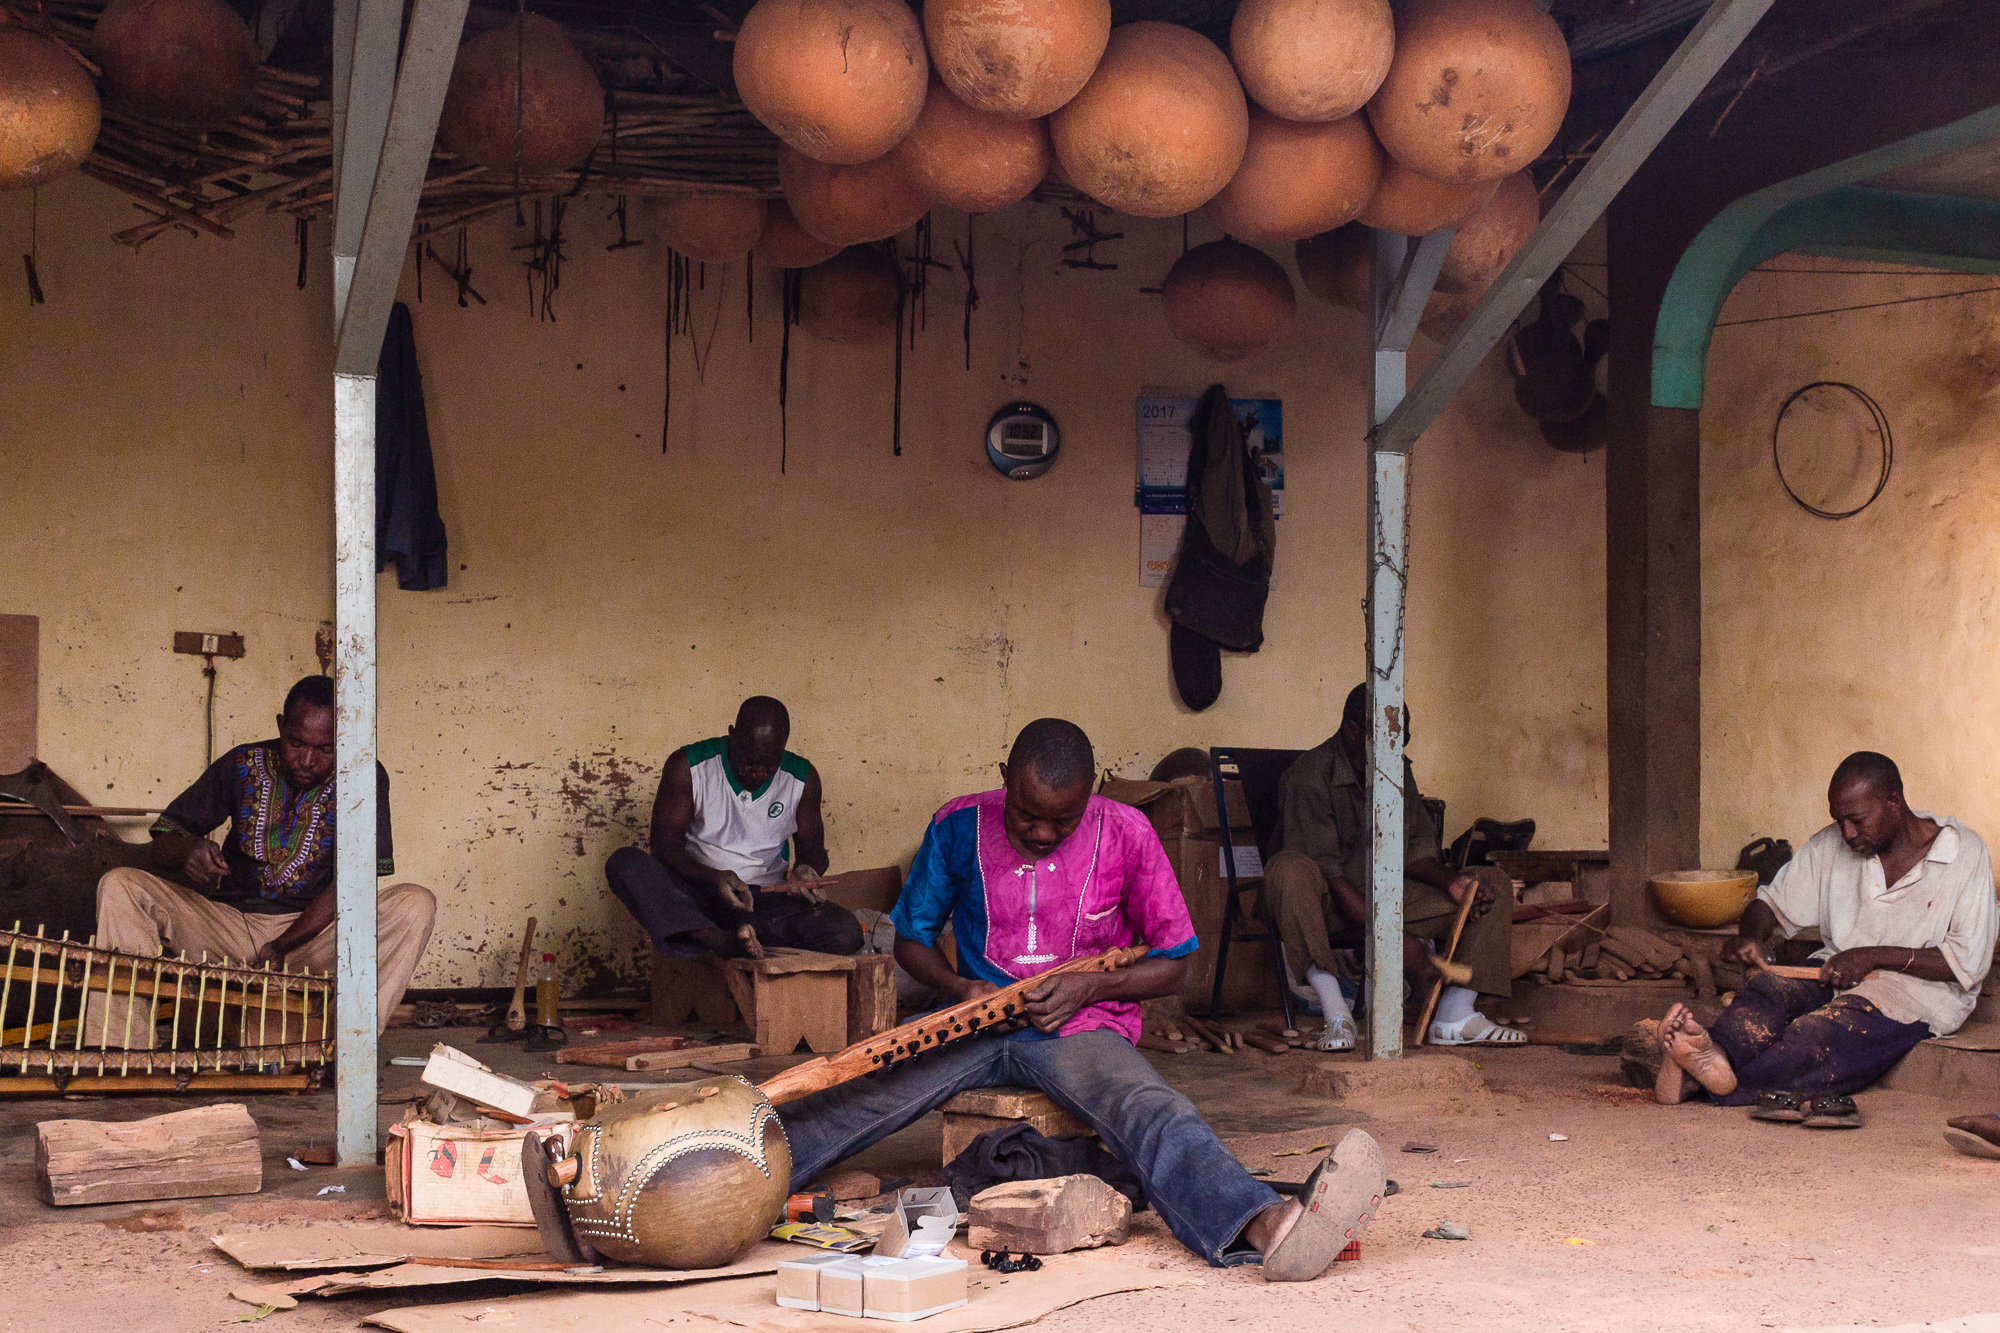 Artisan fabriquant un n'goni, atelier BaraGnouma, Bobo Dioulasso, Burkina Faso